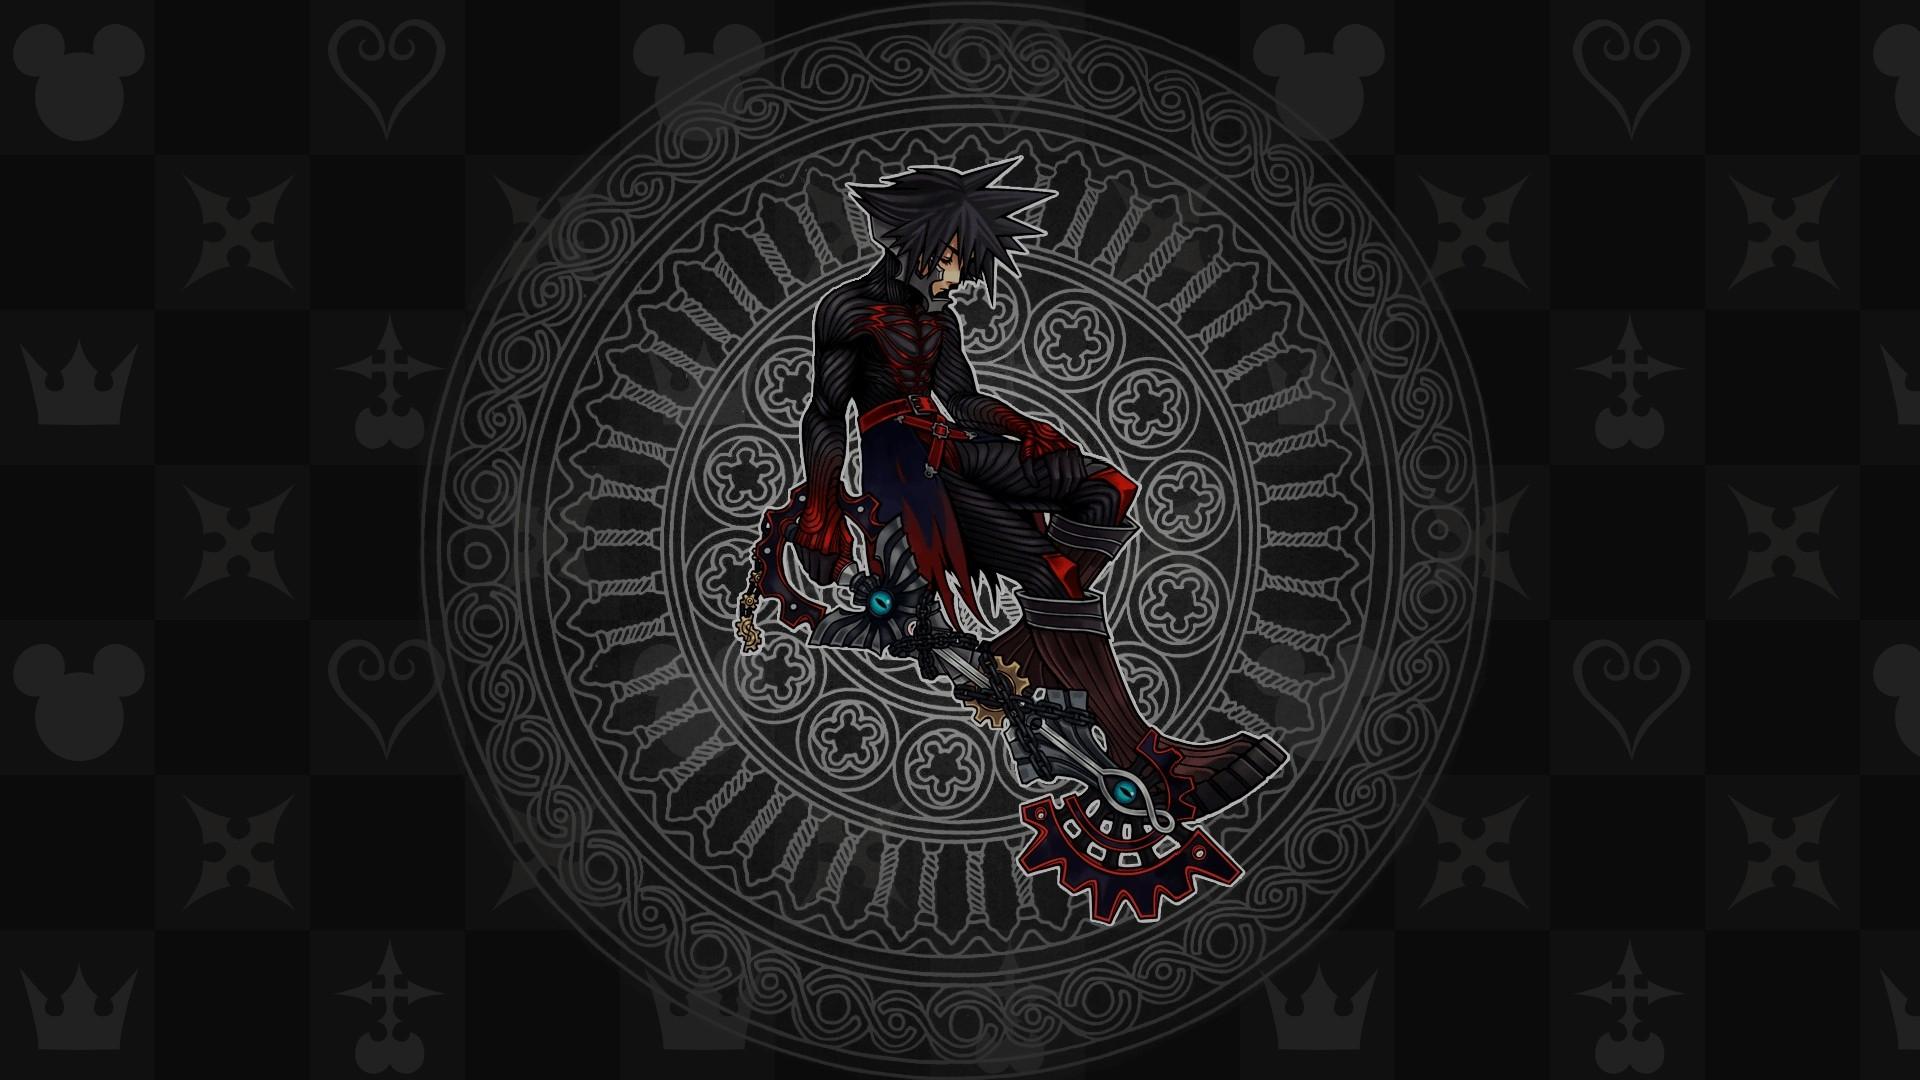 Kingdom Hearts Wallpaper HD